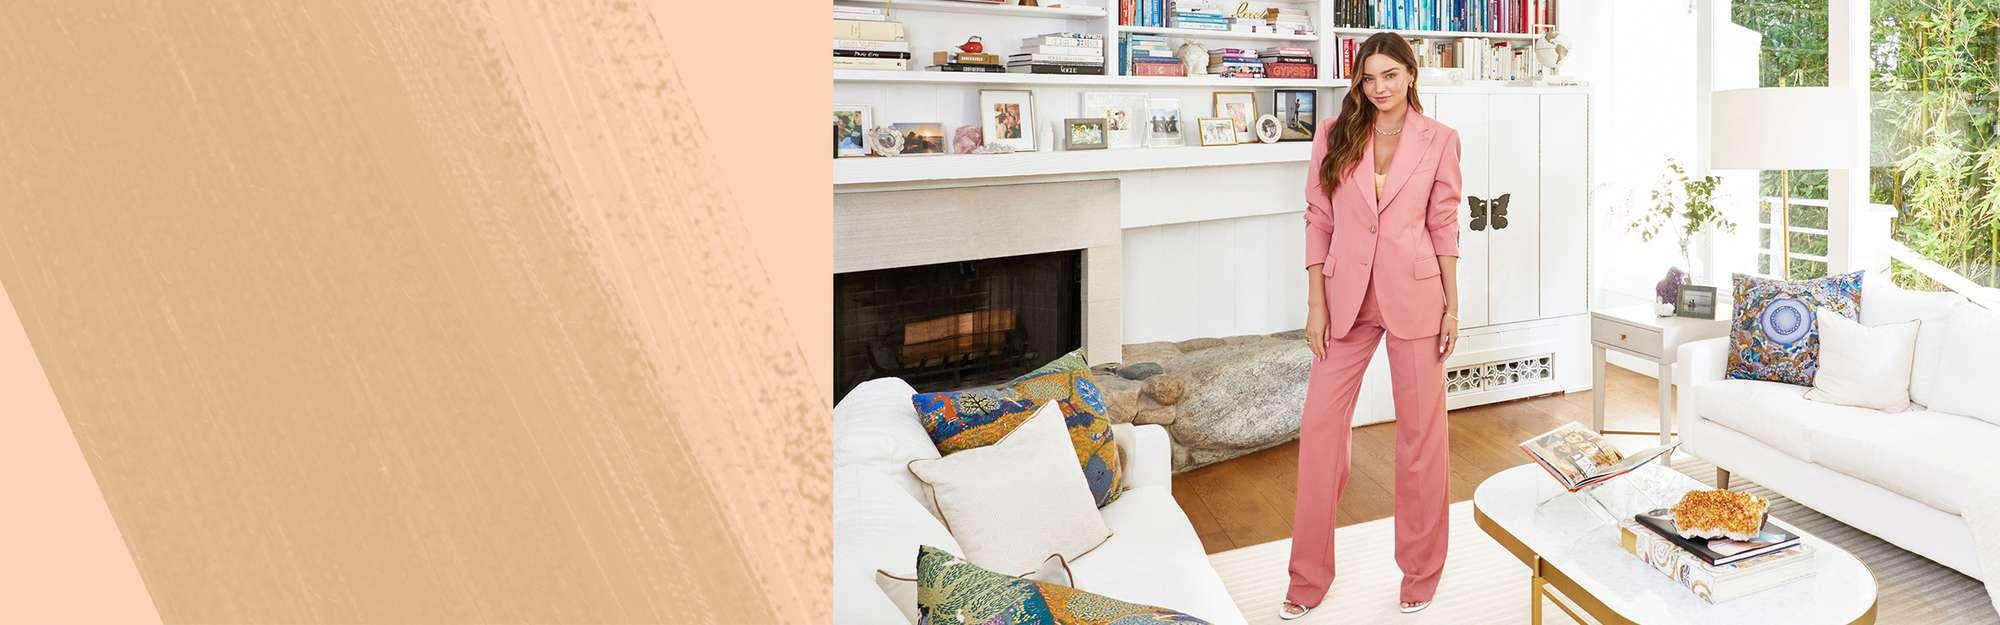 Miranda Kerr in her Malibu living room